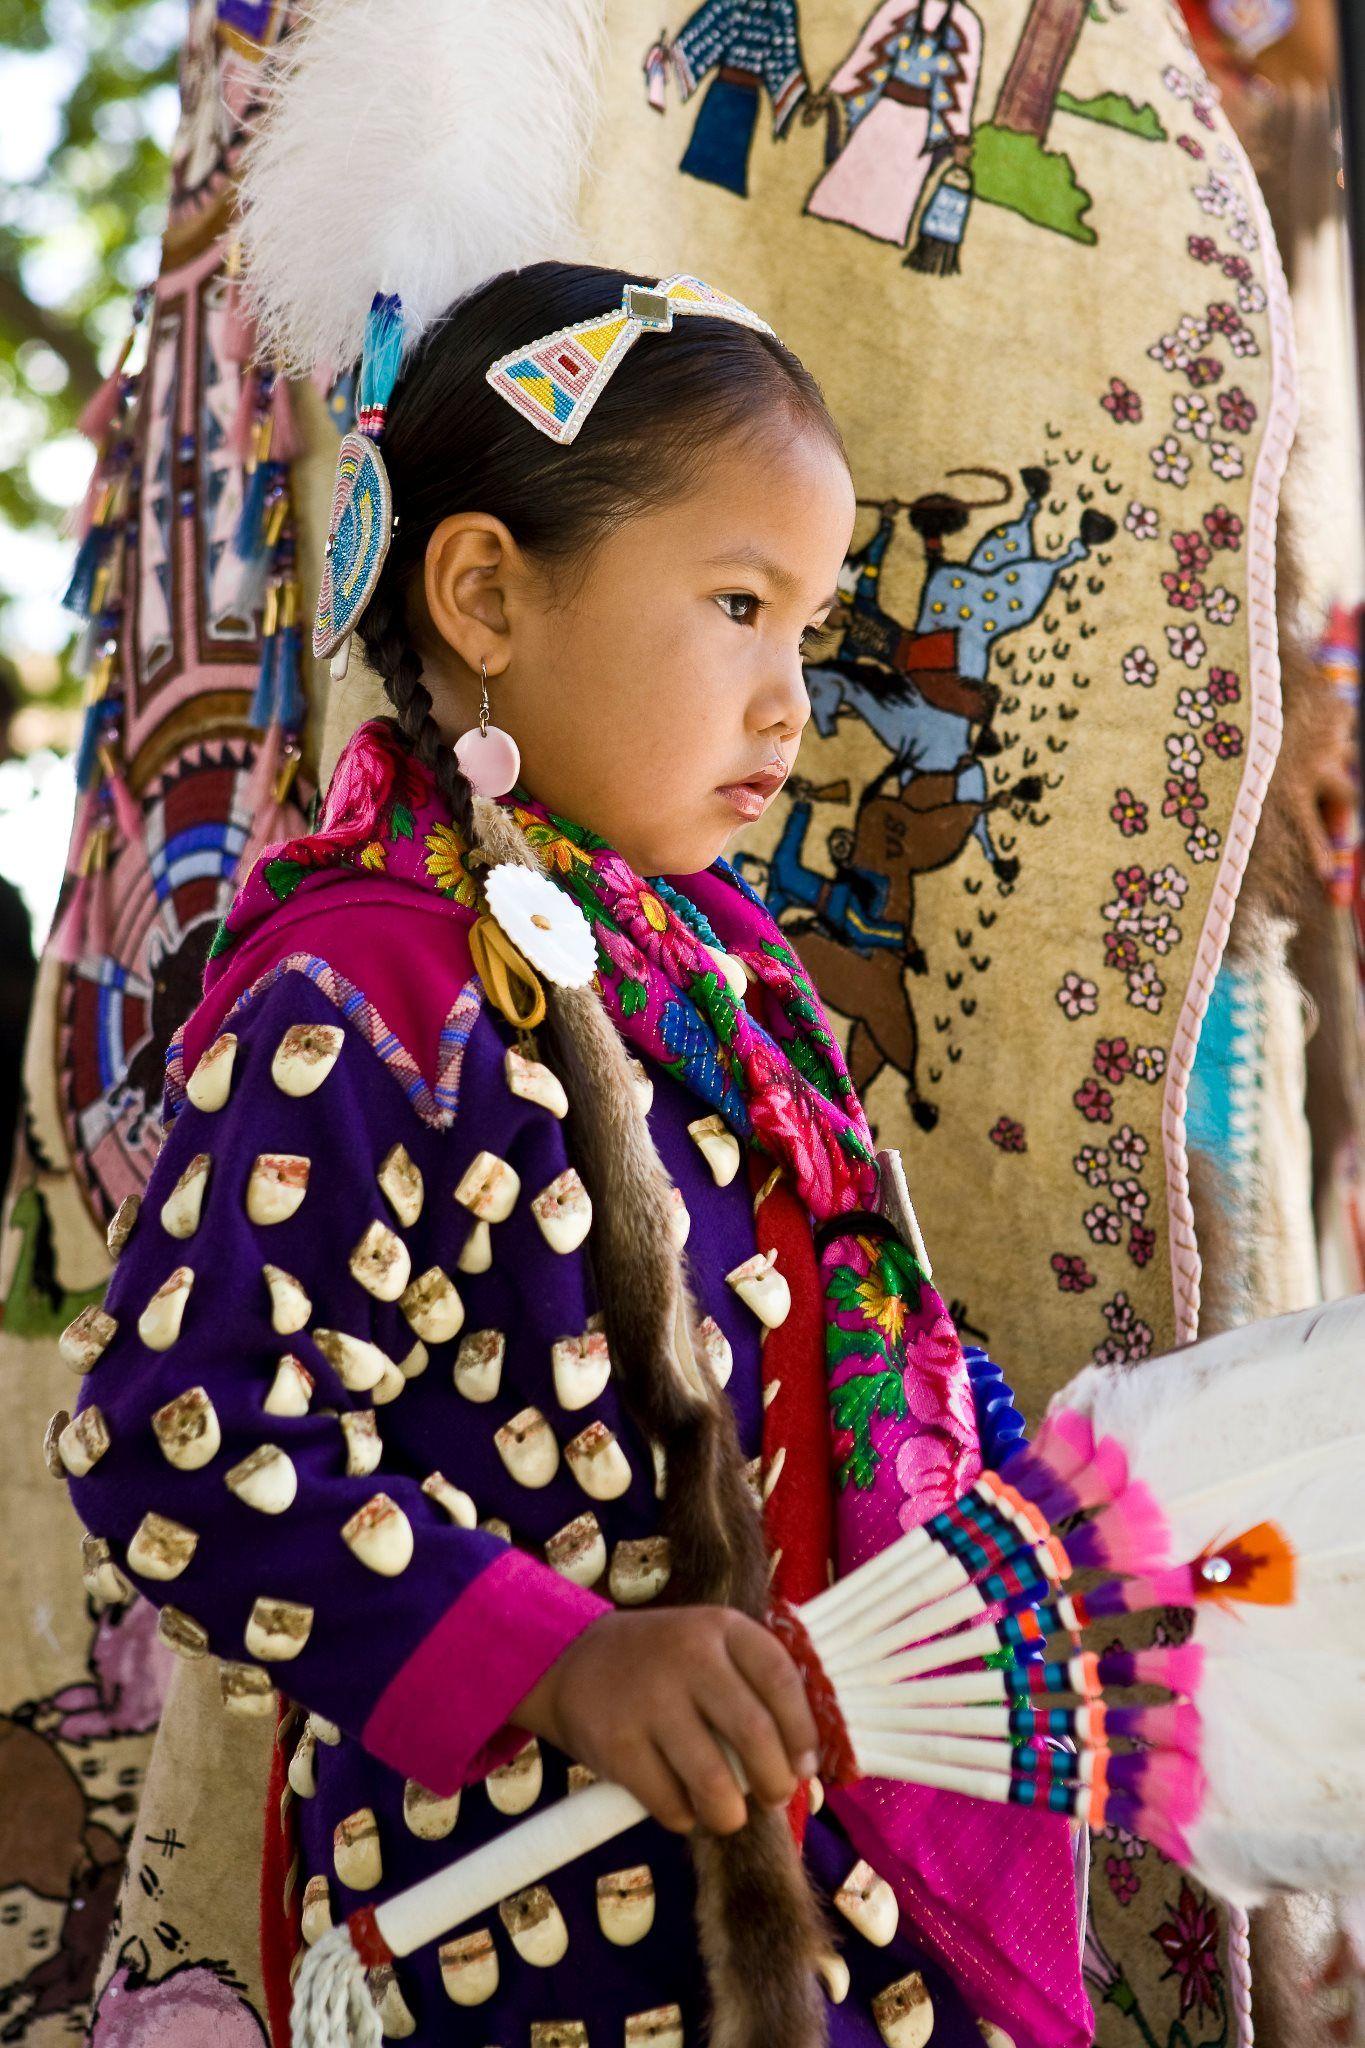 native american (photo: the Santa Fe Indian Market, http://www. santafeindianmarket.com)